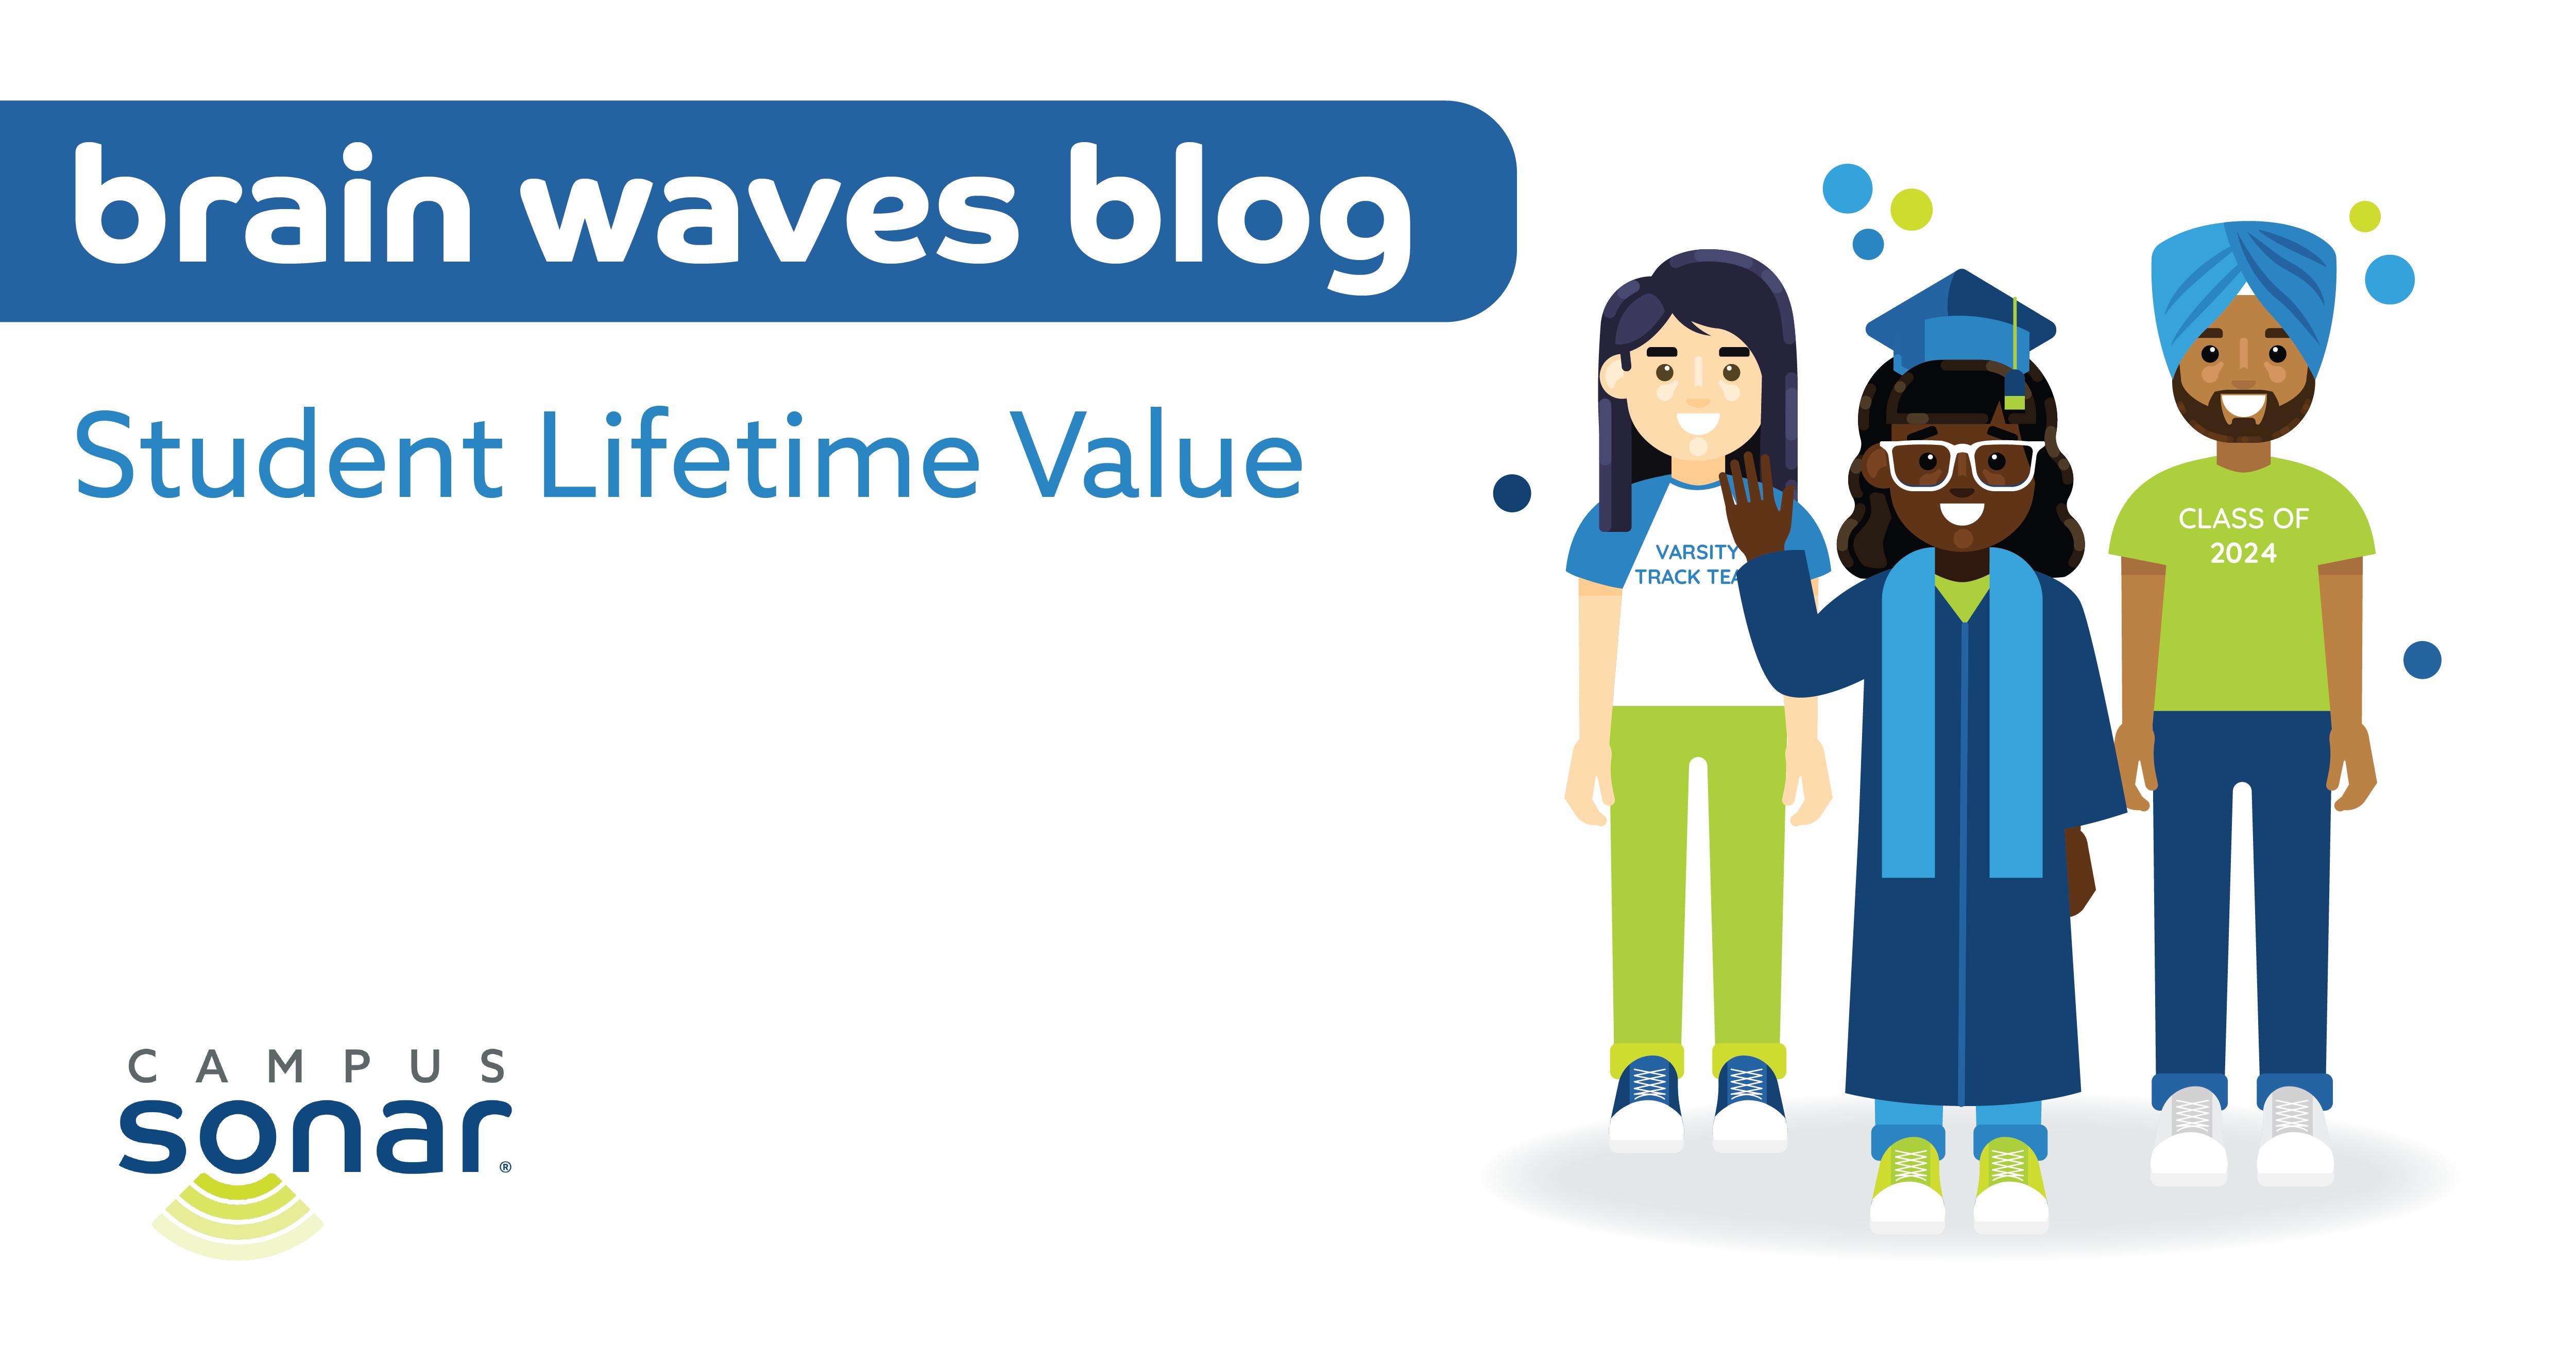 Blog post image for Student Lifetime Value